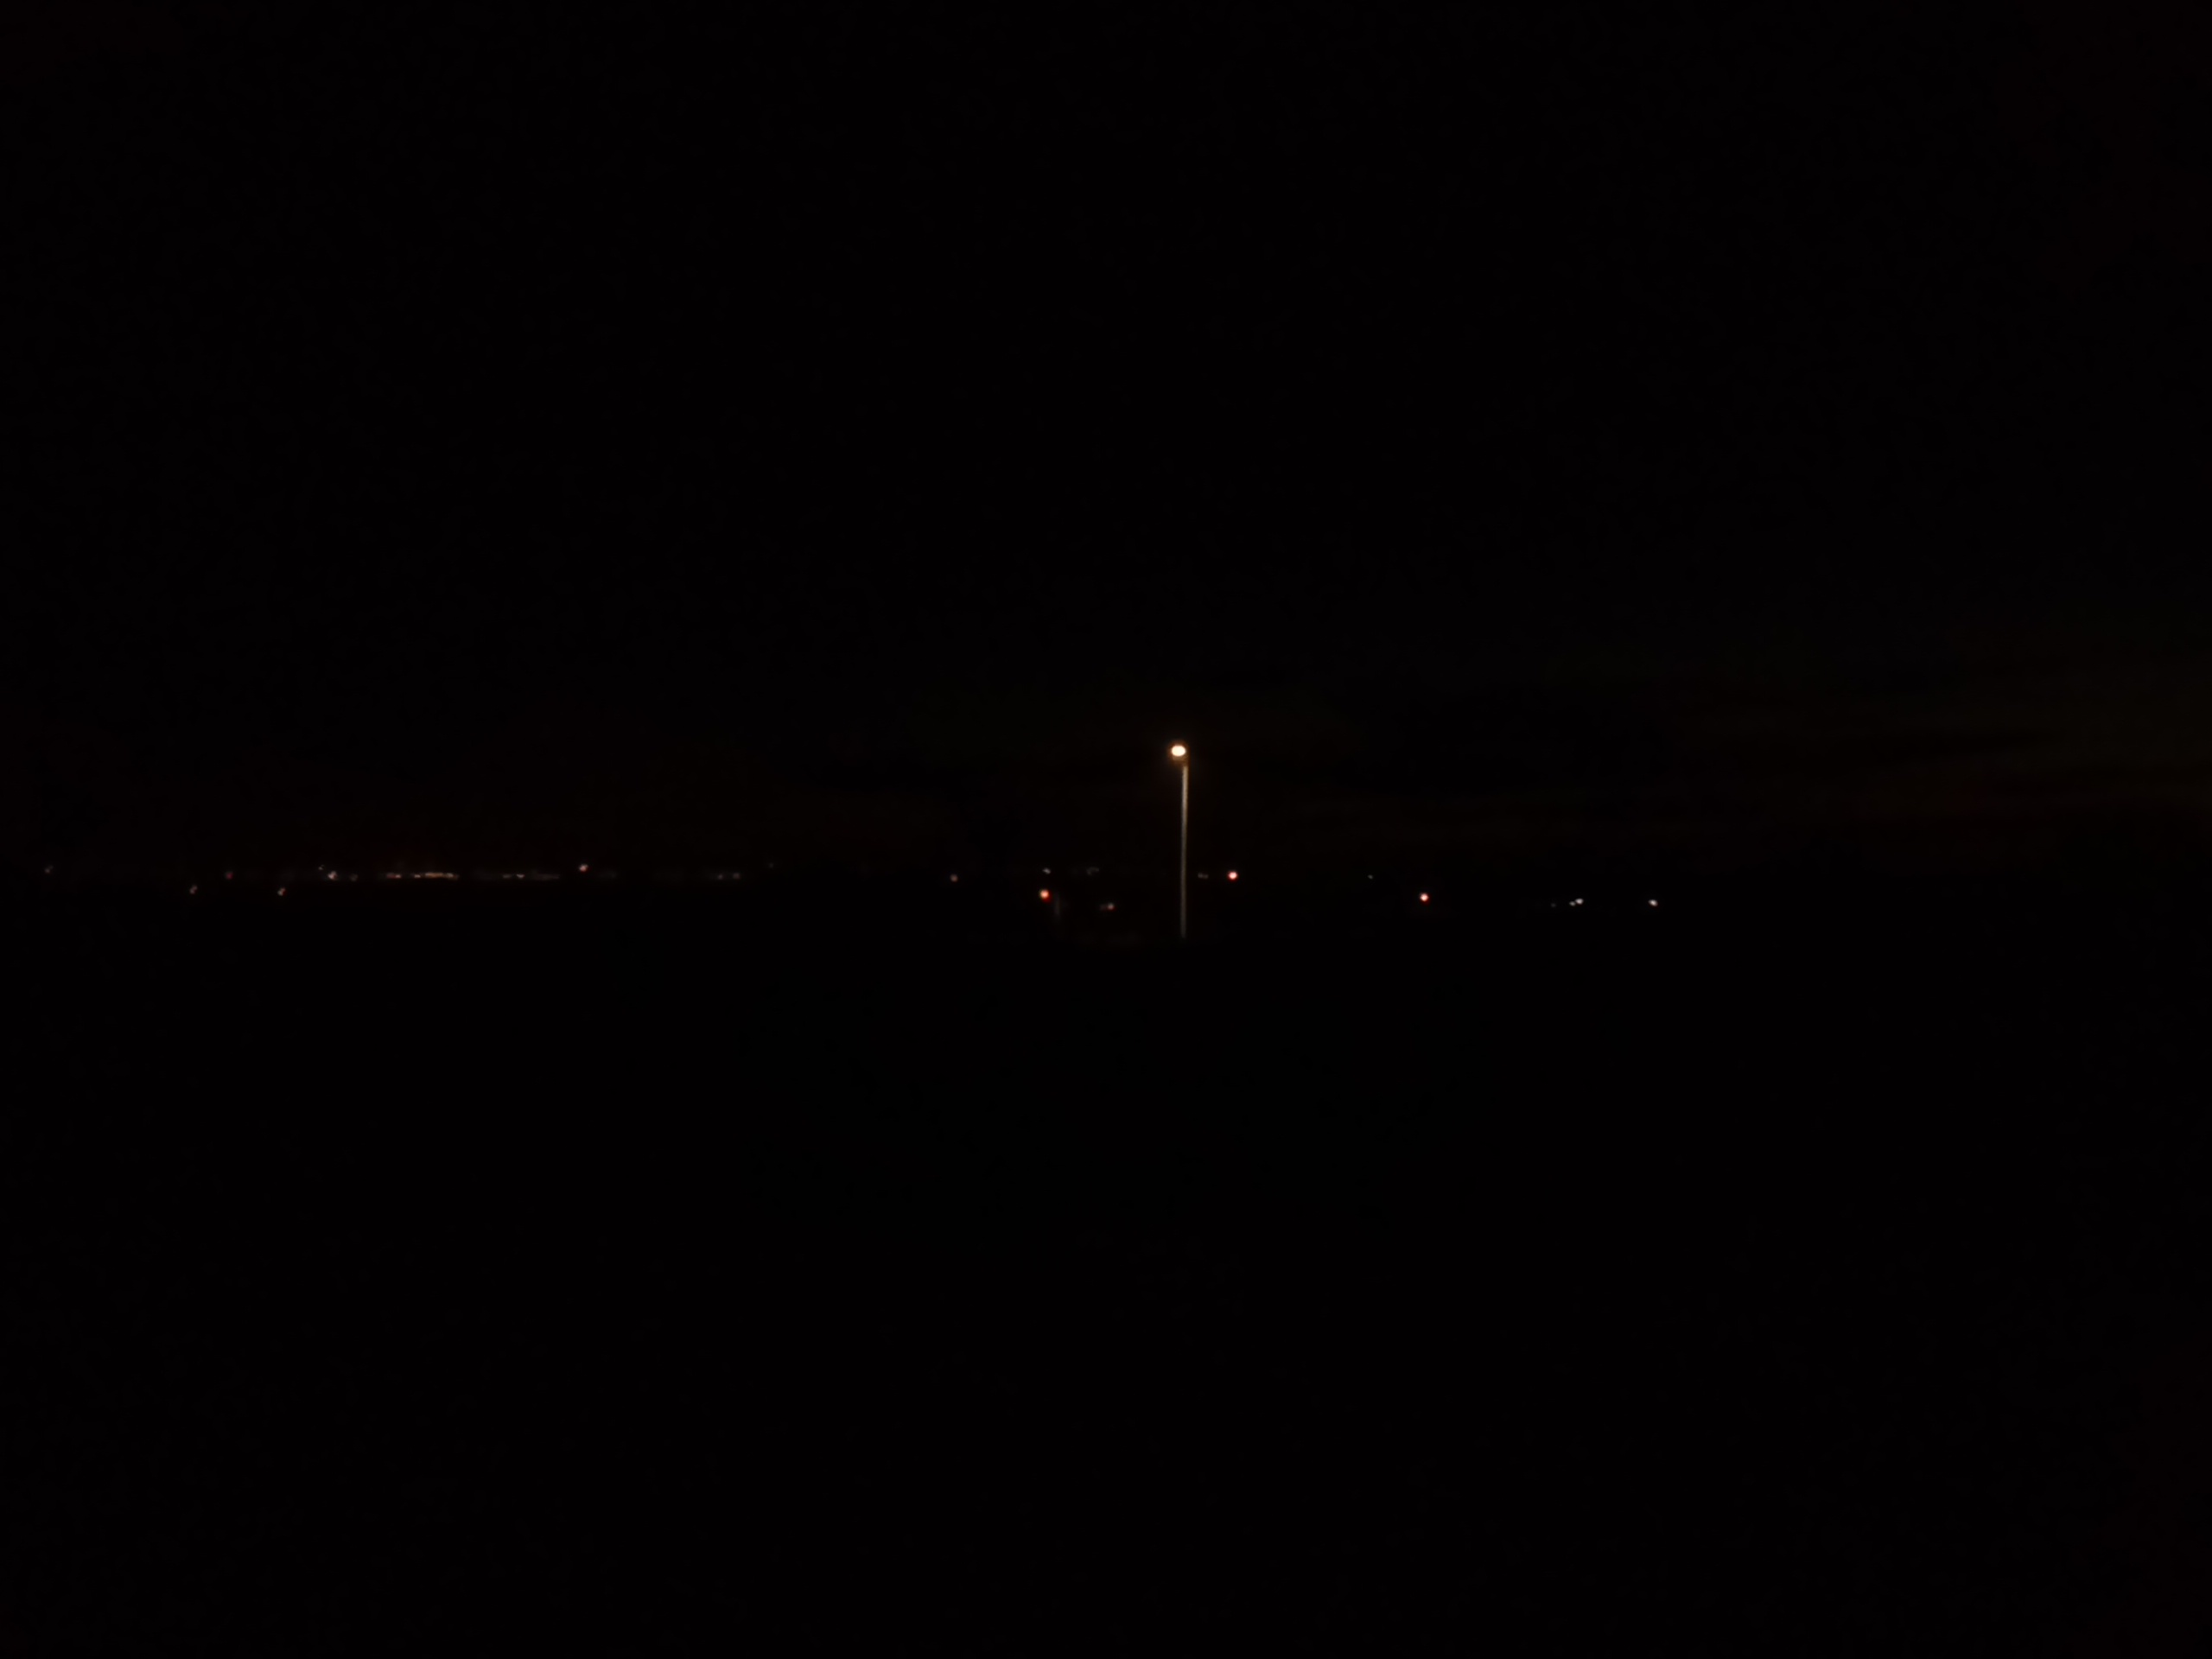 LED-lampa infarten till station Linné